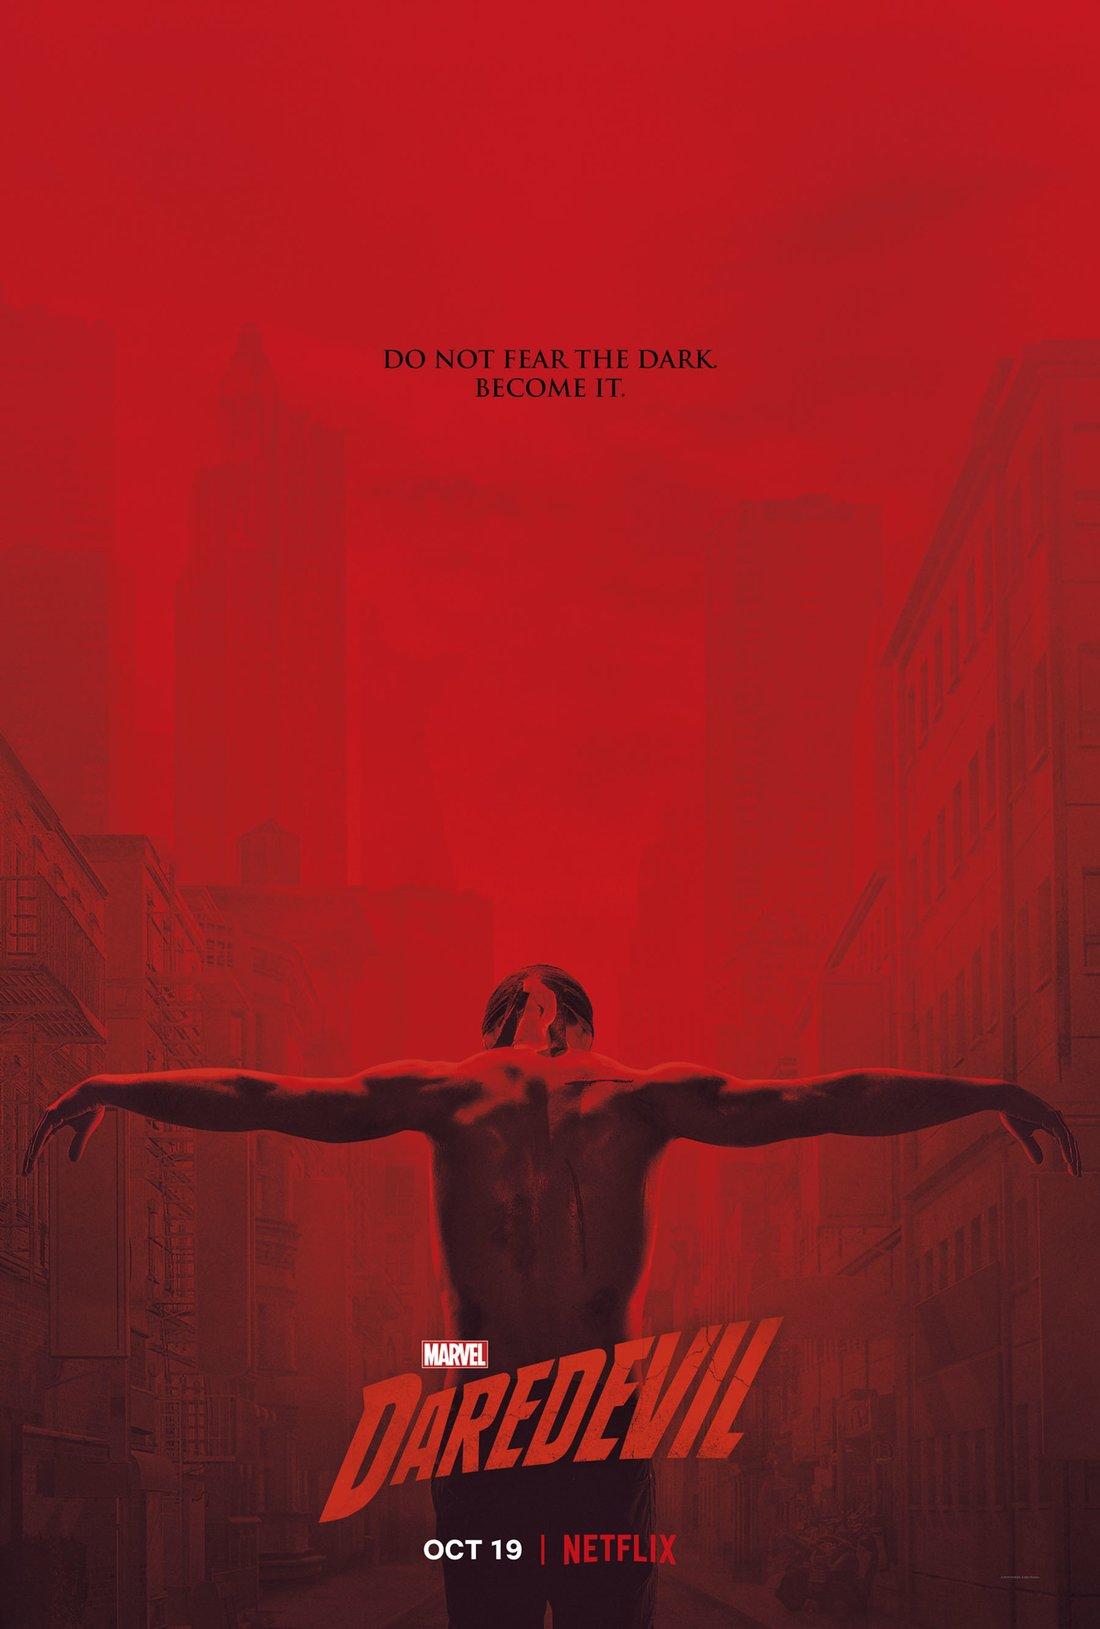 daredevil season 3 poster Daredevil season 3 poster